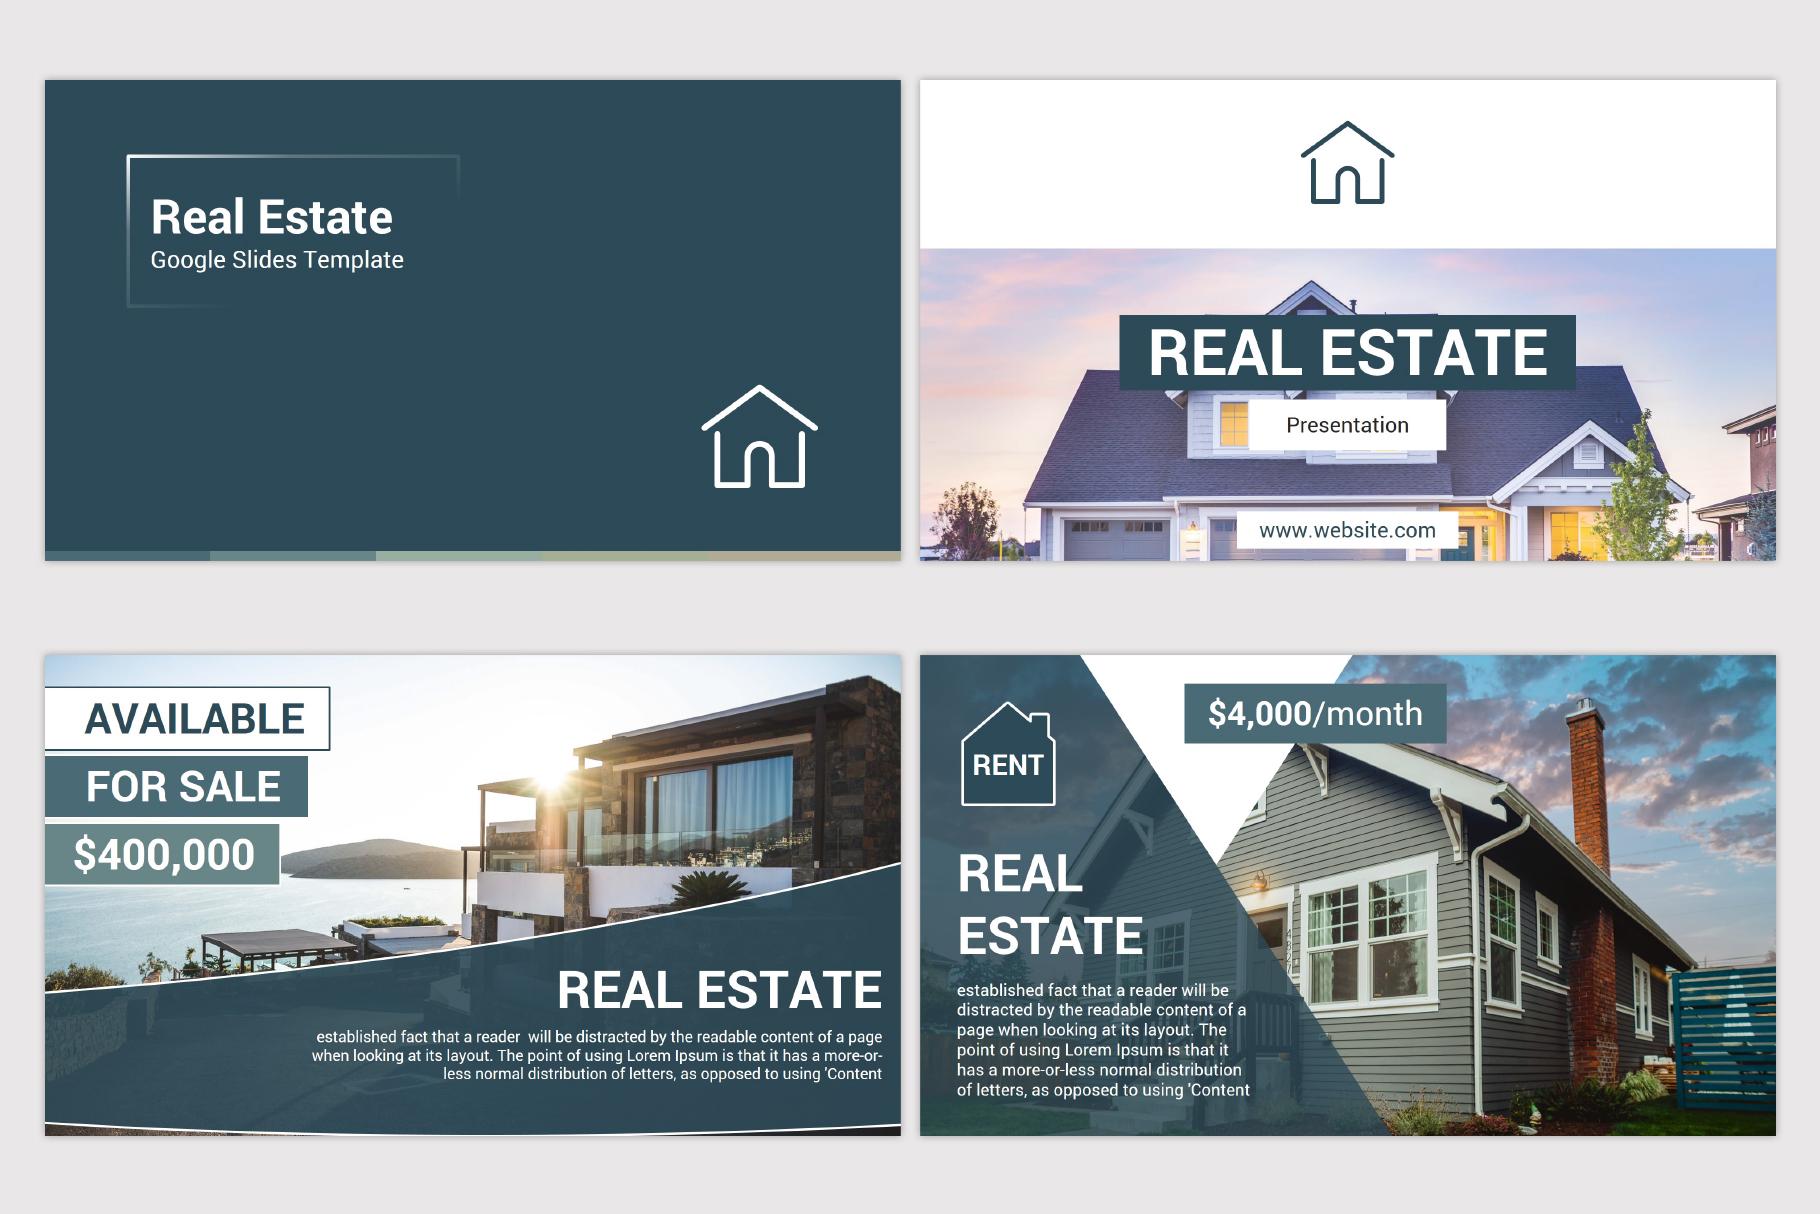 Real Estate Google Slides Template example image 4